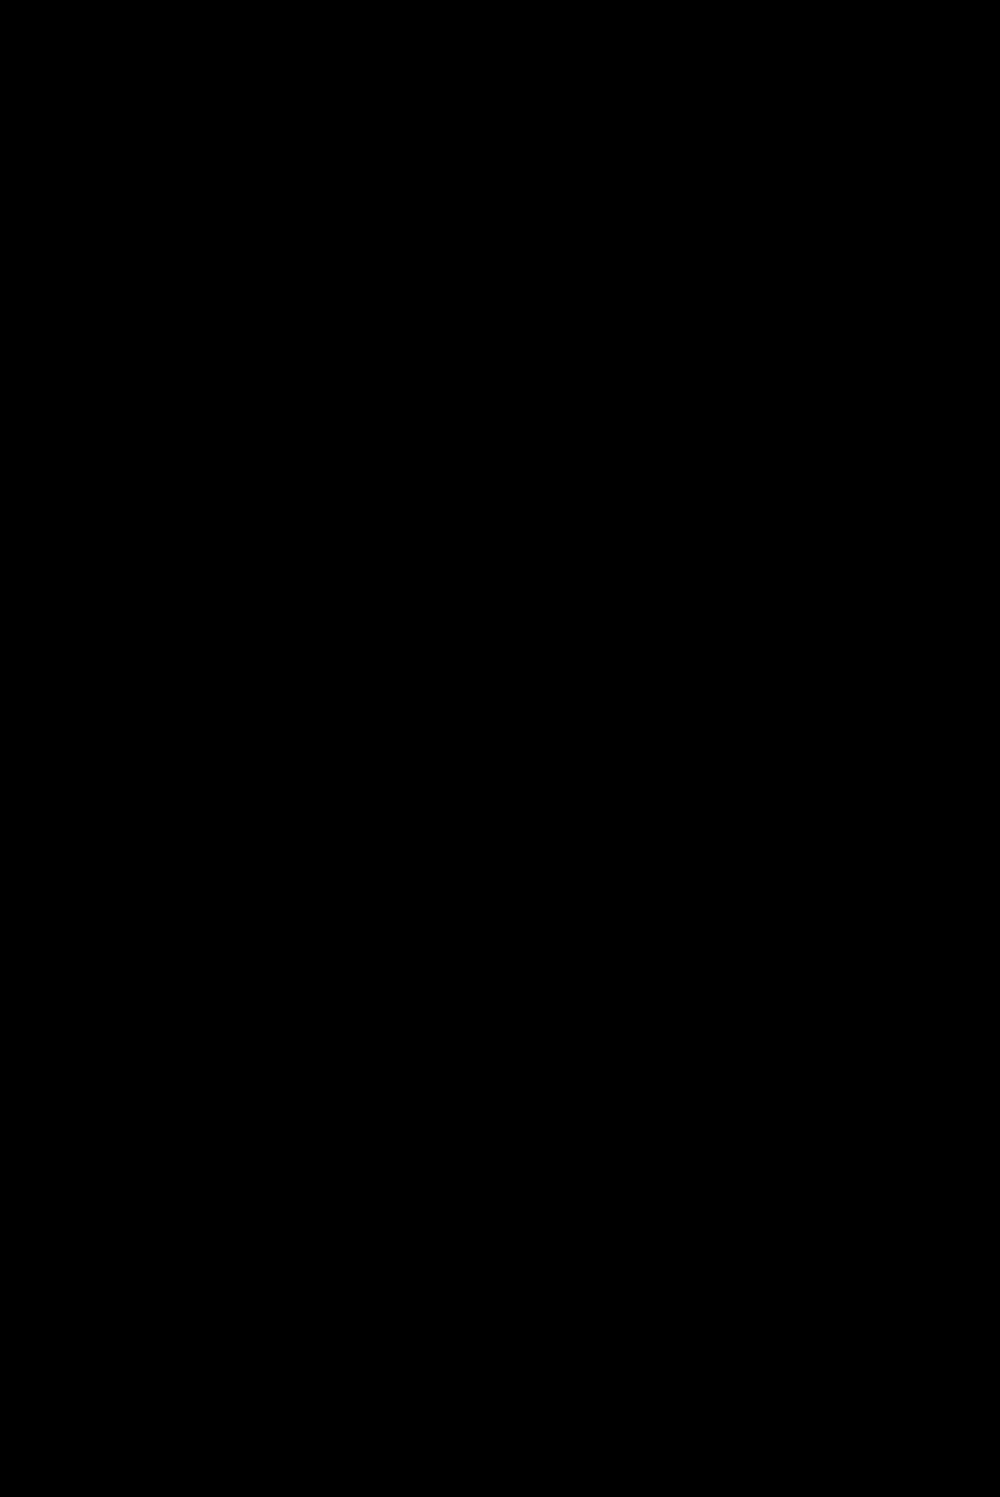 Technical drawing of Feeding Tube Holder